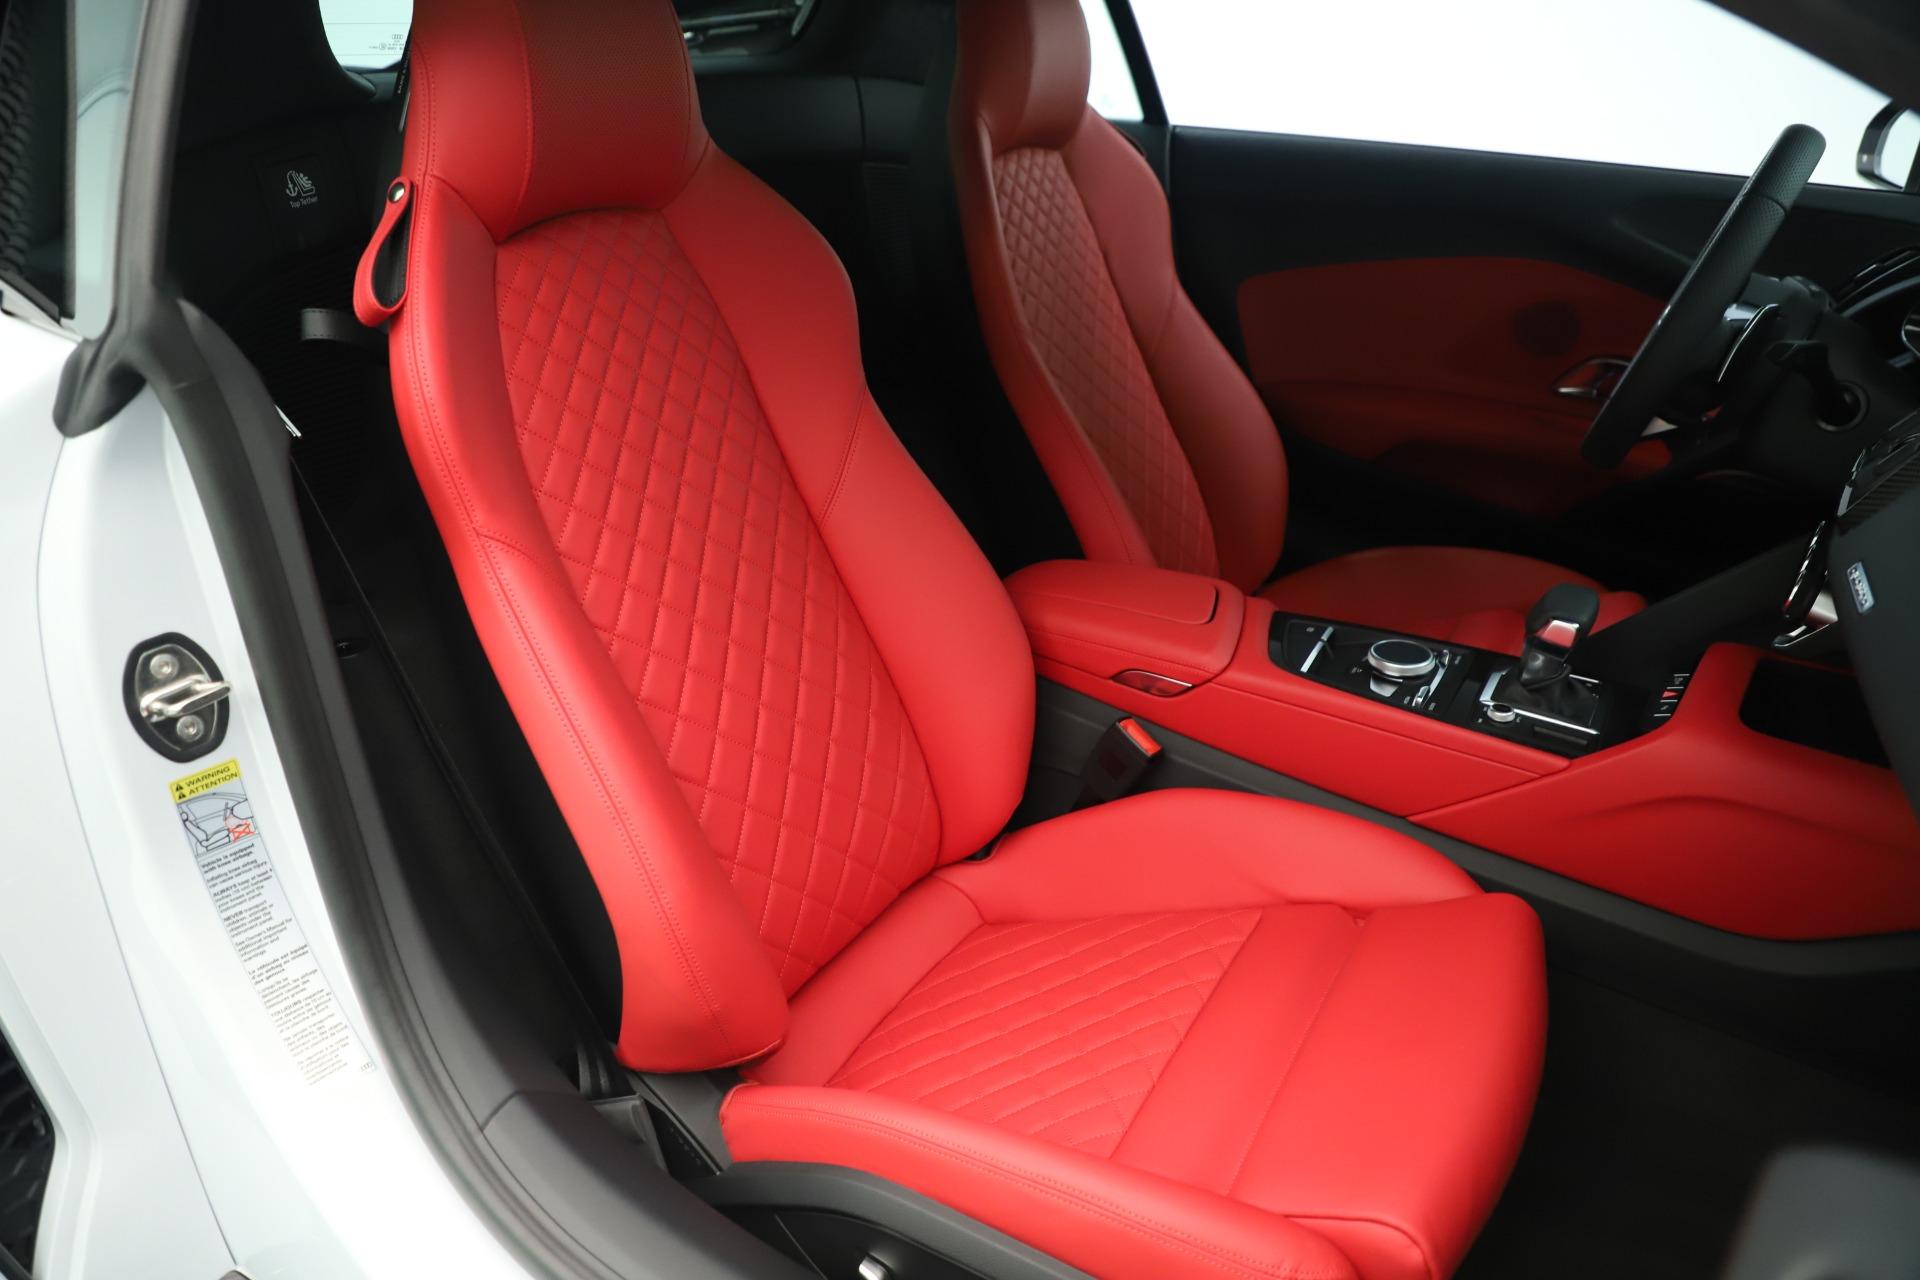 Used 2018 Audi R8 5.2 quattro V10 Plus For Sale In Greenwich, CT 3360_p20